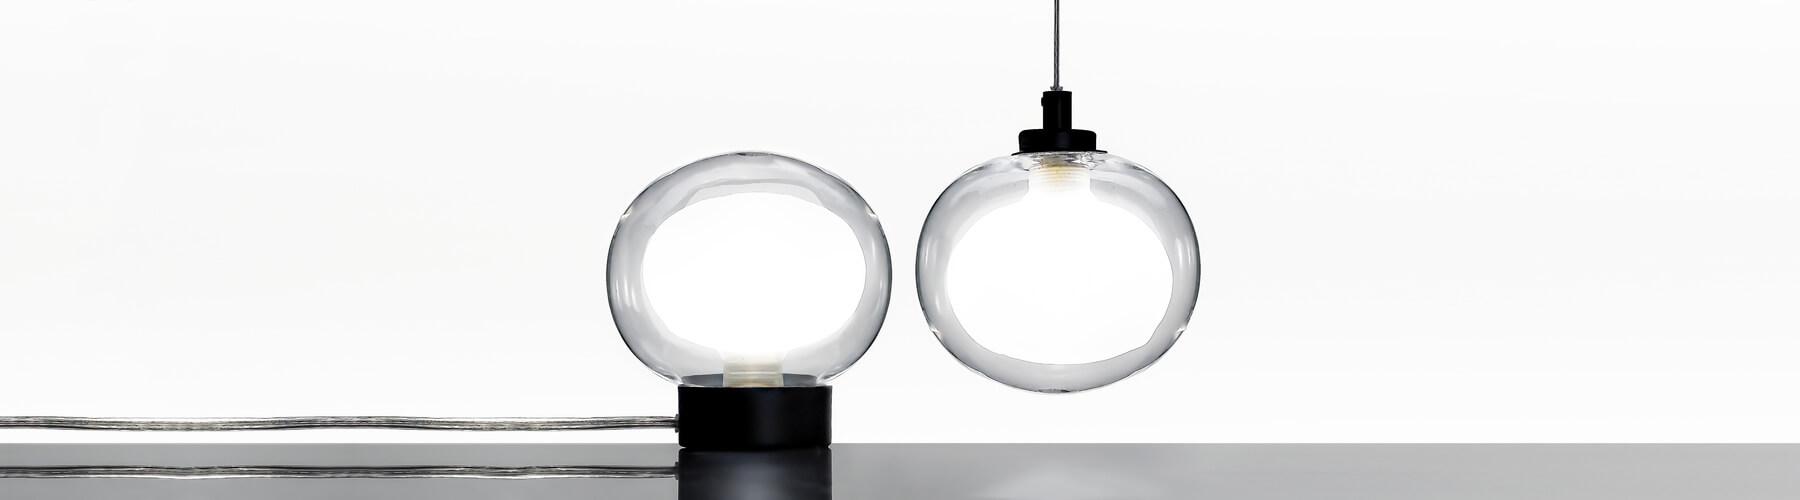 lampen leuchten kerzenleuchter aus glas glasklar berlin. Black Bedroom Furniture Sets. Home Design Ideas